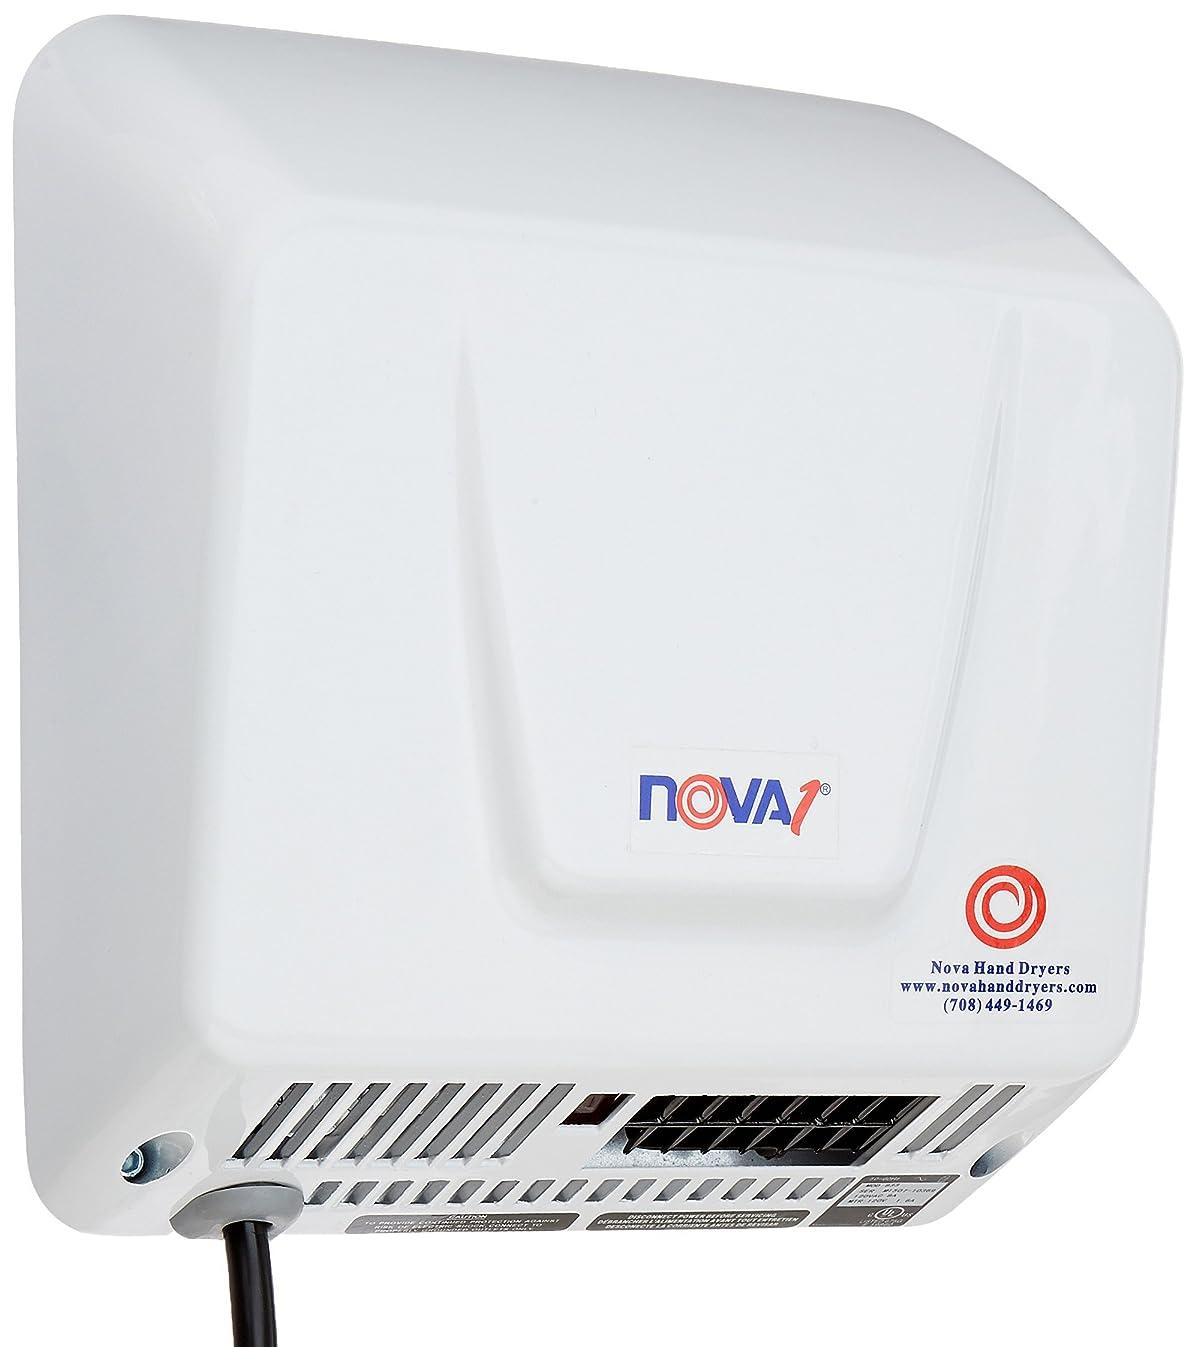 NOVA 0833 Economical Hand Dryers, 1 Plug-in, 110-220V